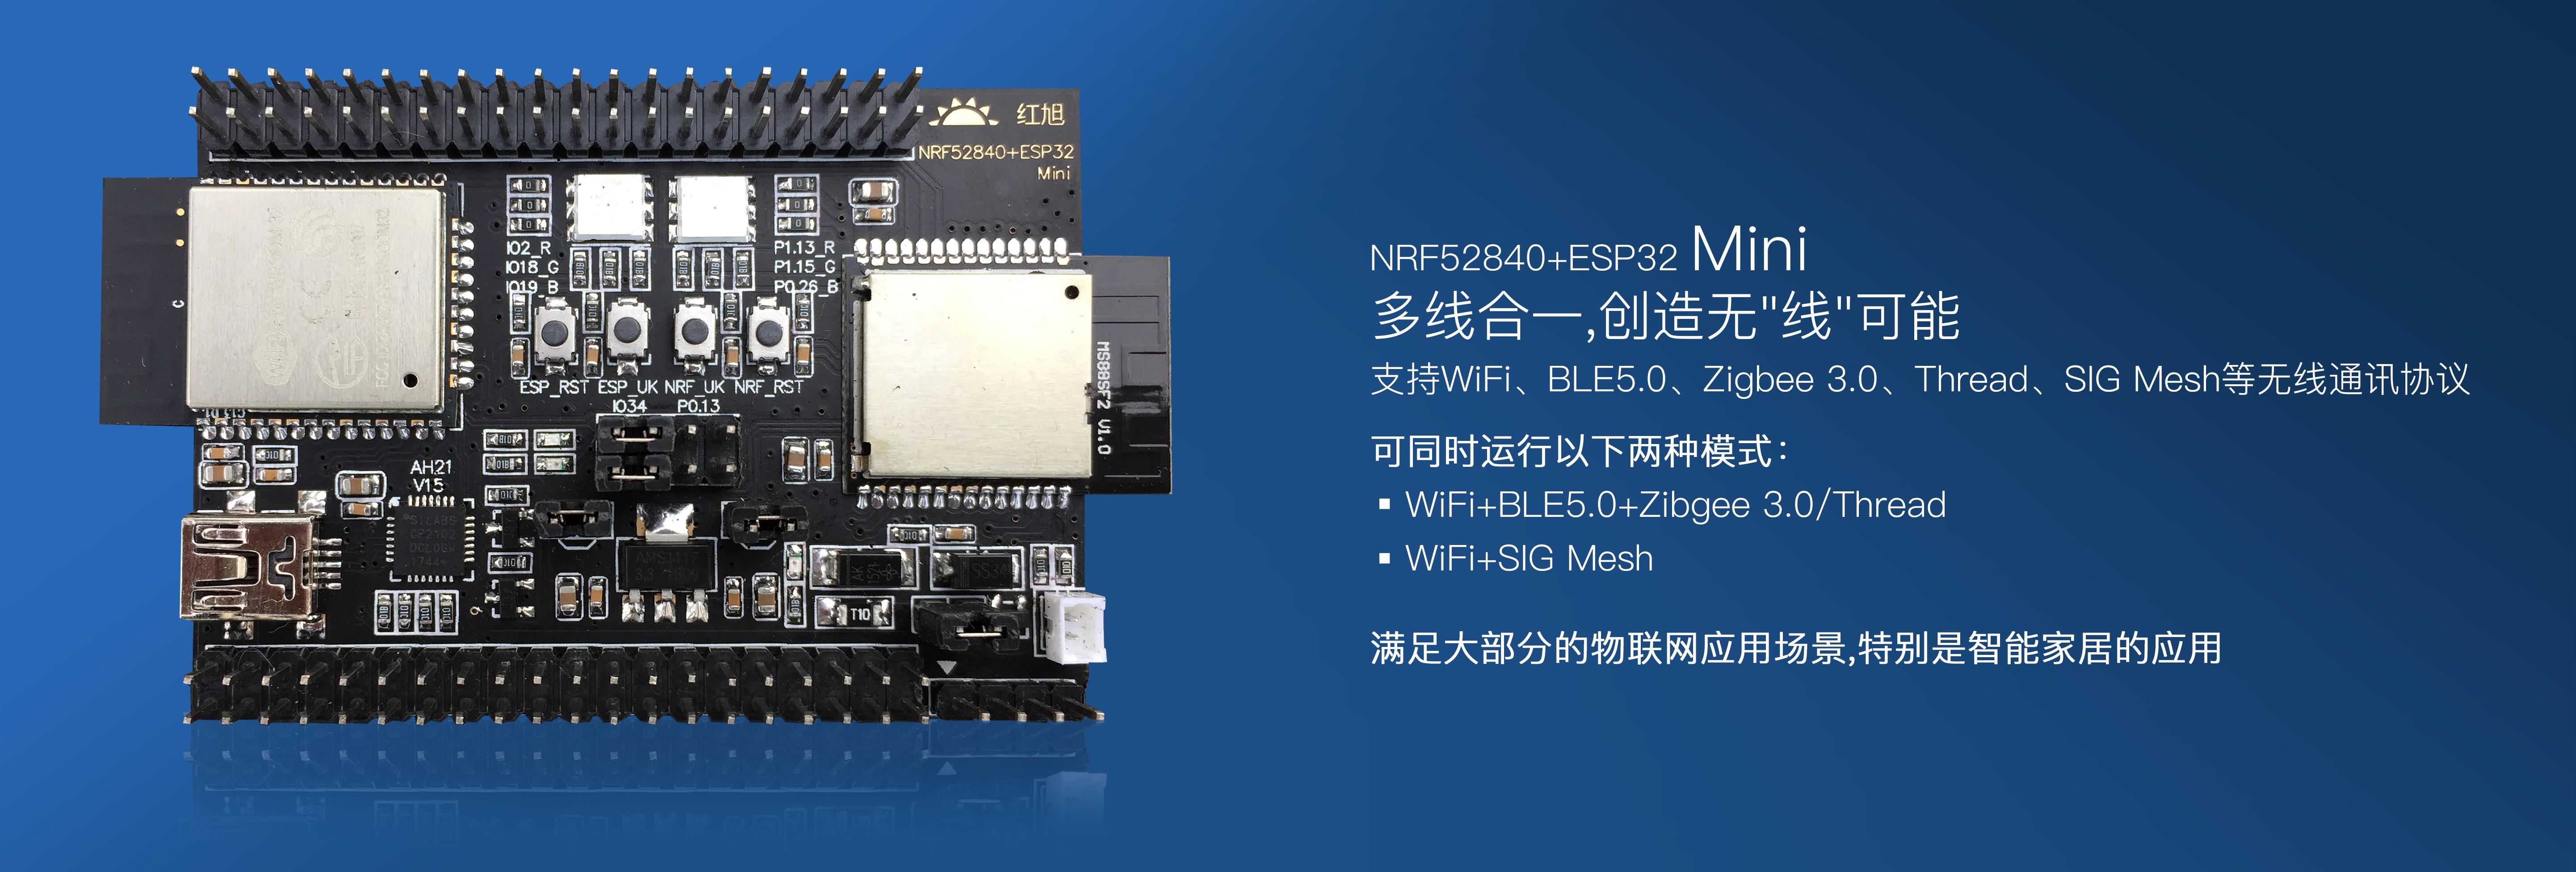 NRF52840+ESP32 Mini海报图